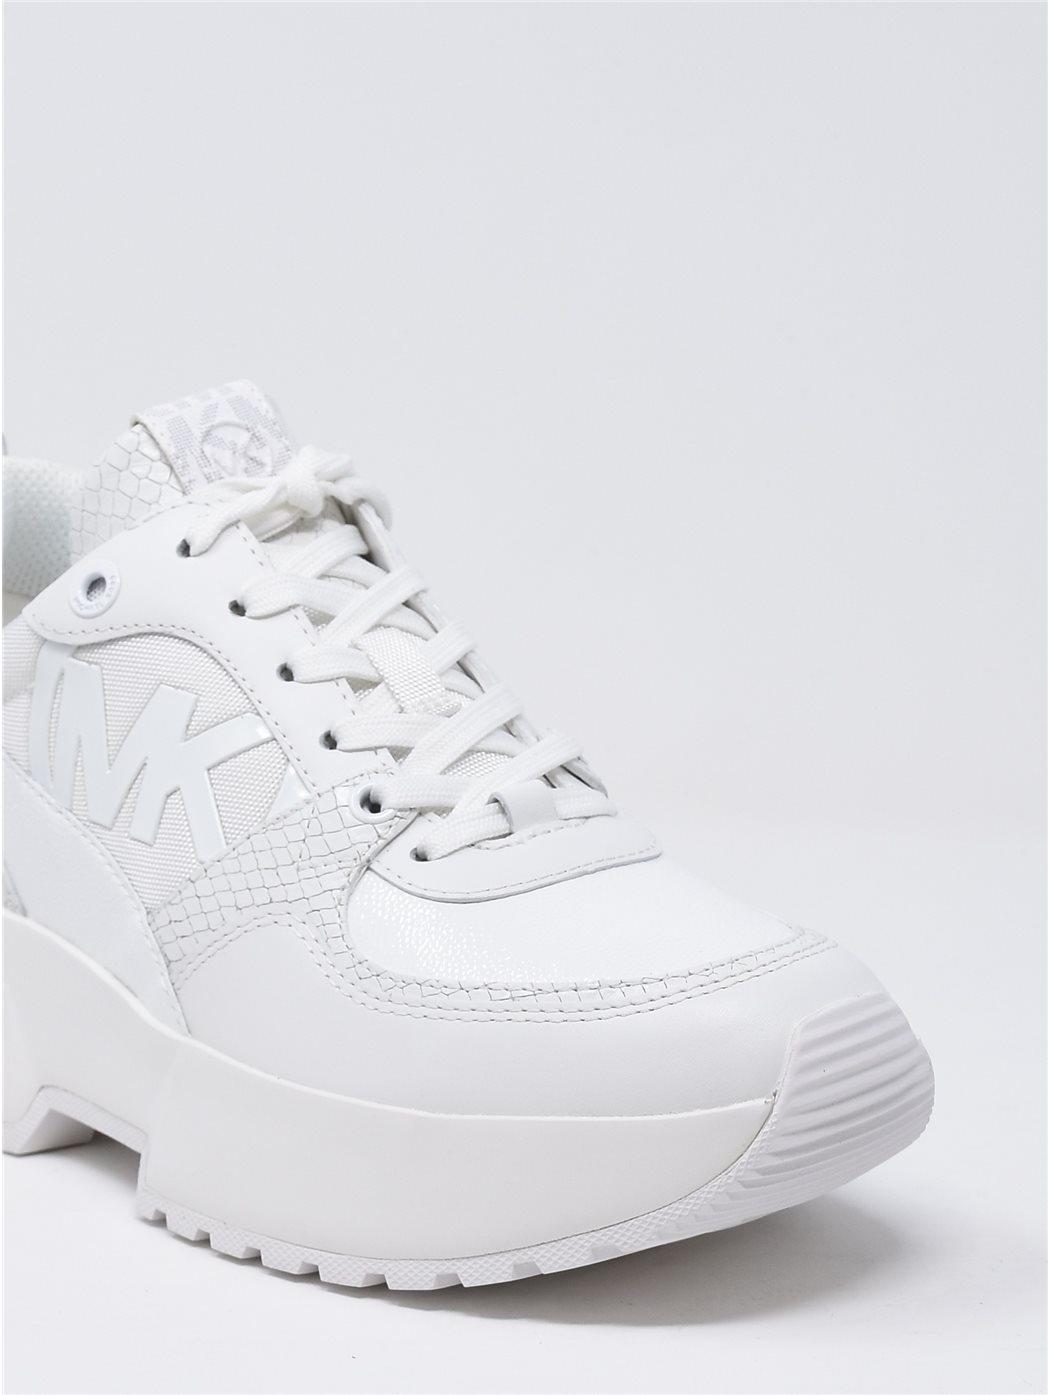 MICHAEL KORS 43R0BL 085-WHITE SNEAKERS